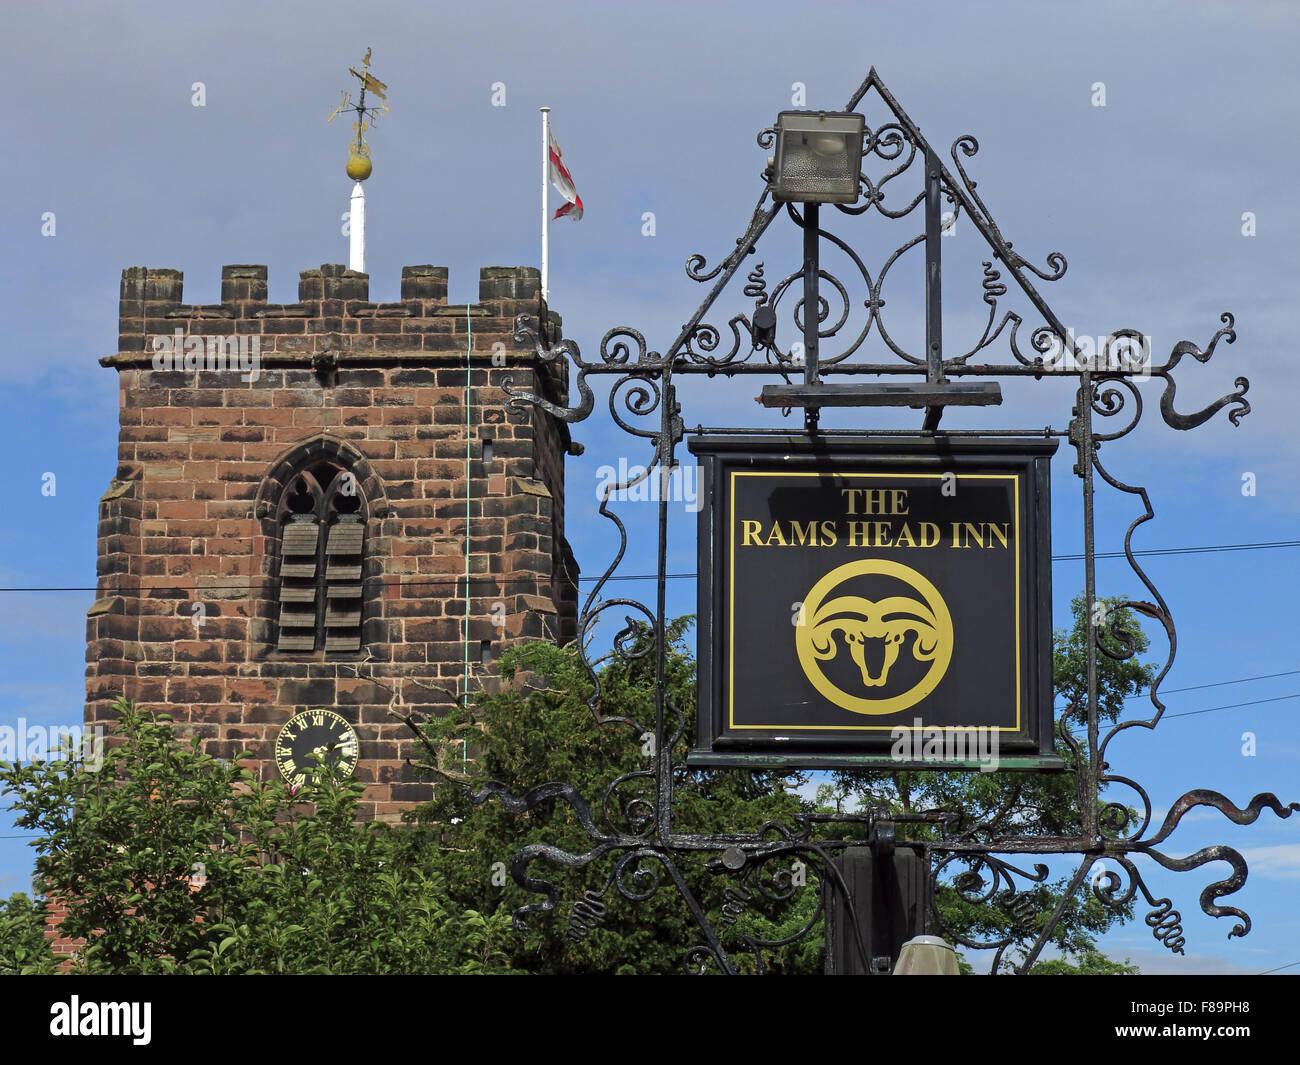 Rams Head inn sign & St Wilfrids Church tower ,Grappenhall,Warrington,Cheshire,England,UK Stock Photo